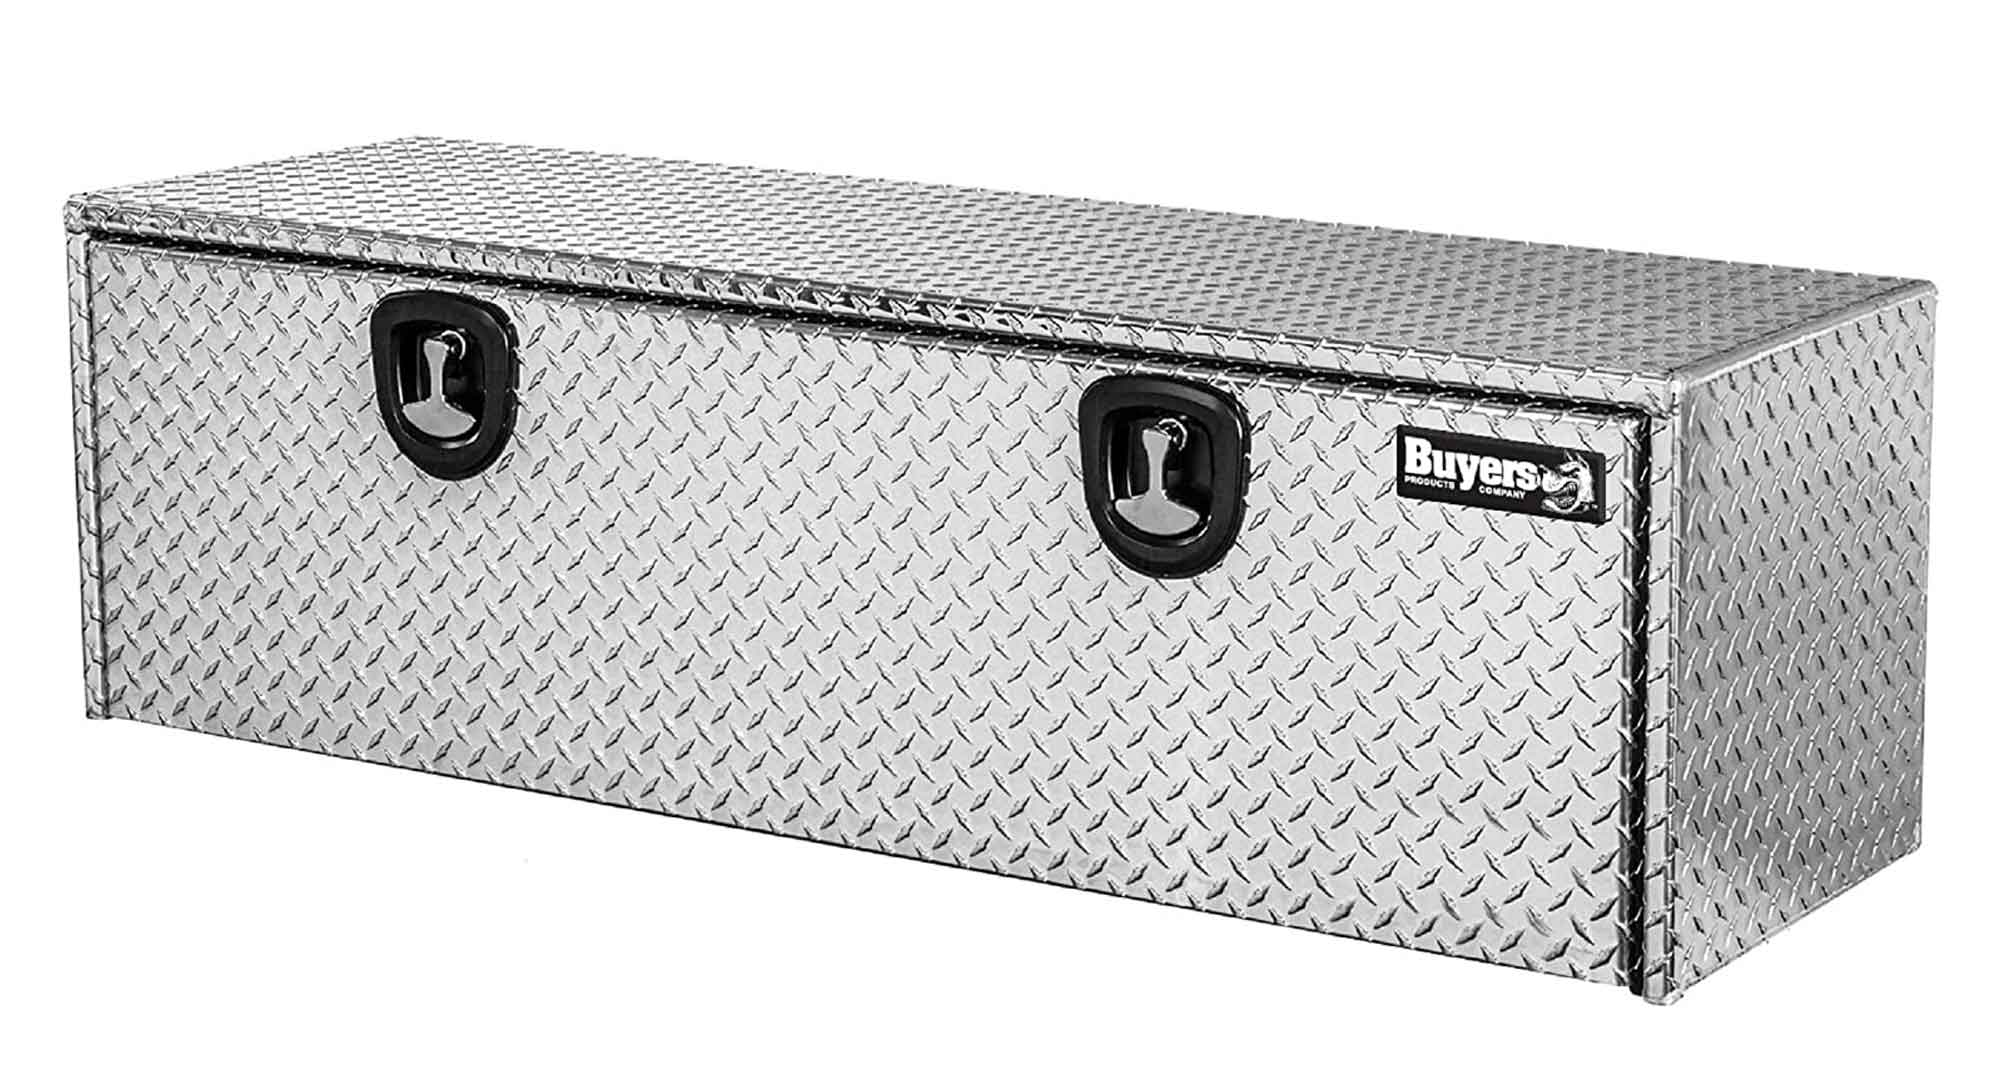 Buyers Products Diamond Tread Aluminum Underbody Truck Box w/ T-Handle Latch (18x18x60 Inch) , Silver